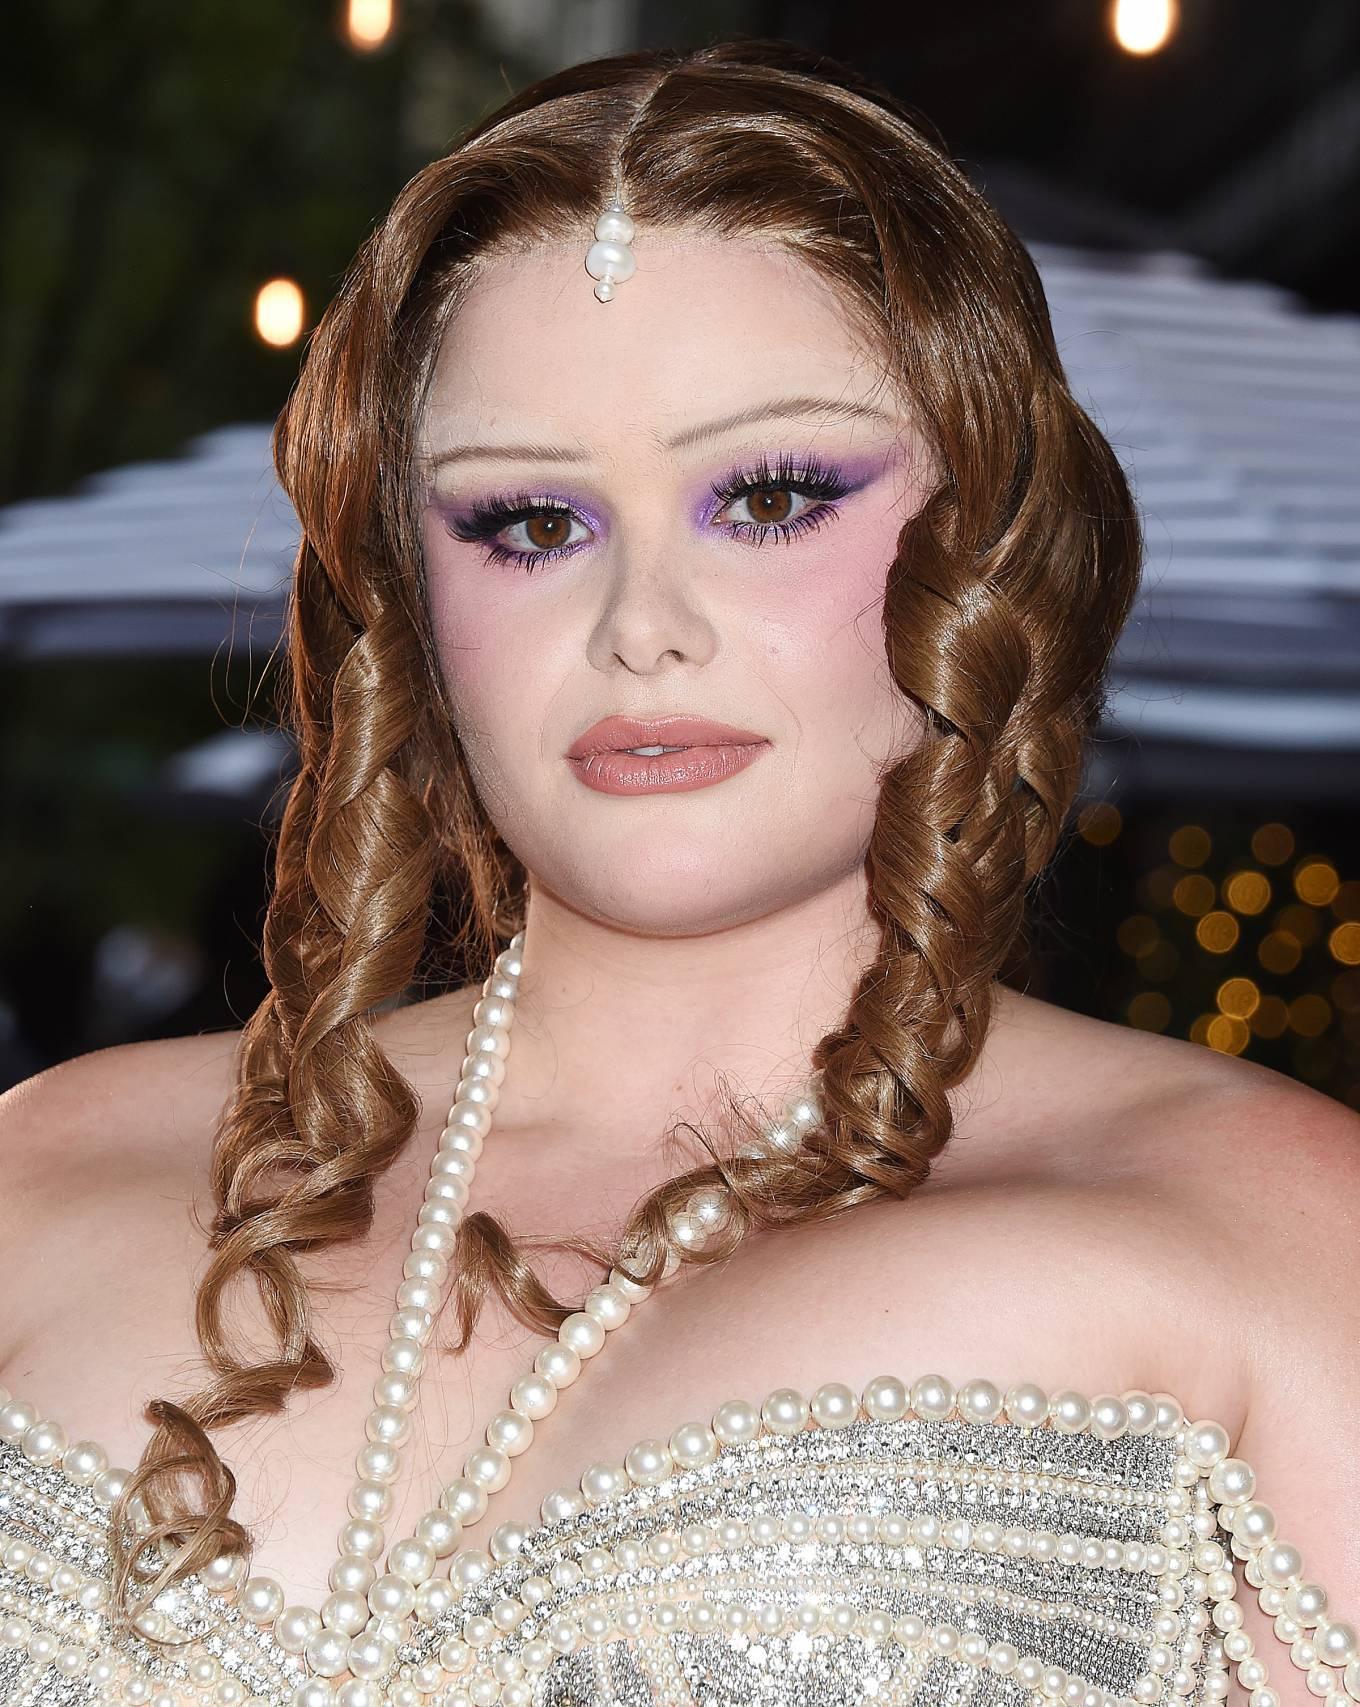 Barbie Ferreira 2021 : Barbie Ferreira – Seen departing The Mark Hotel in New York City for the 2021 Met Gala-06